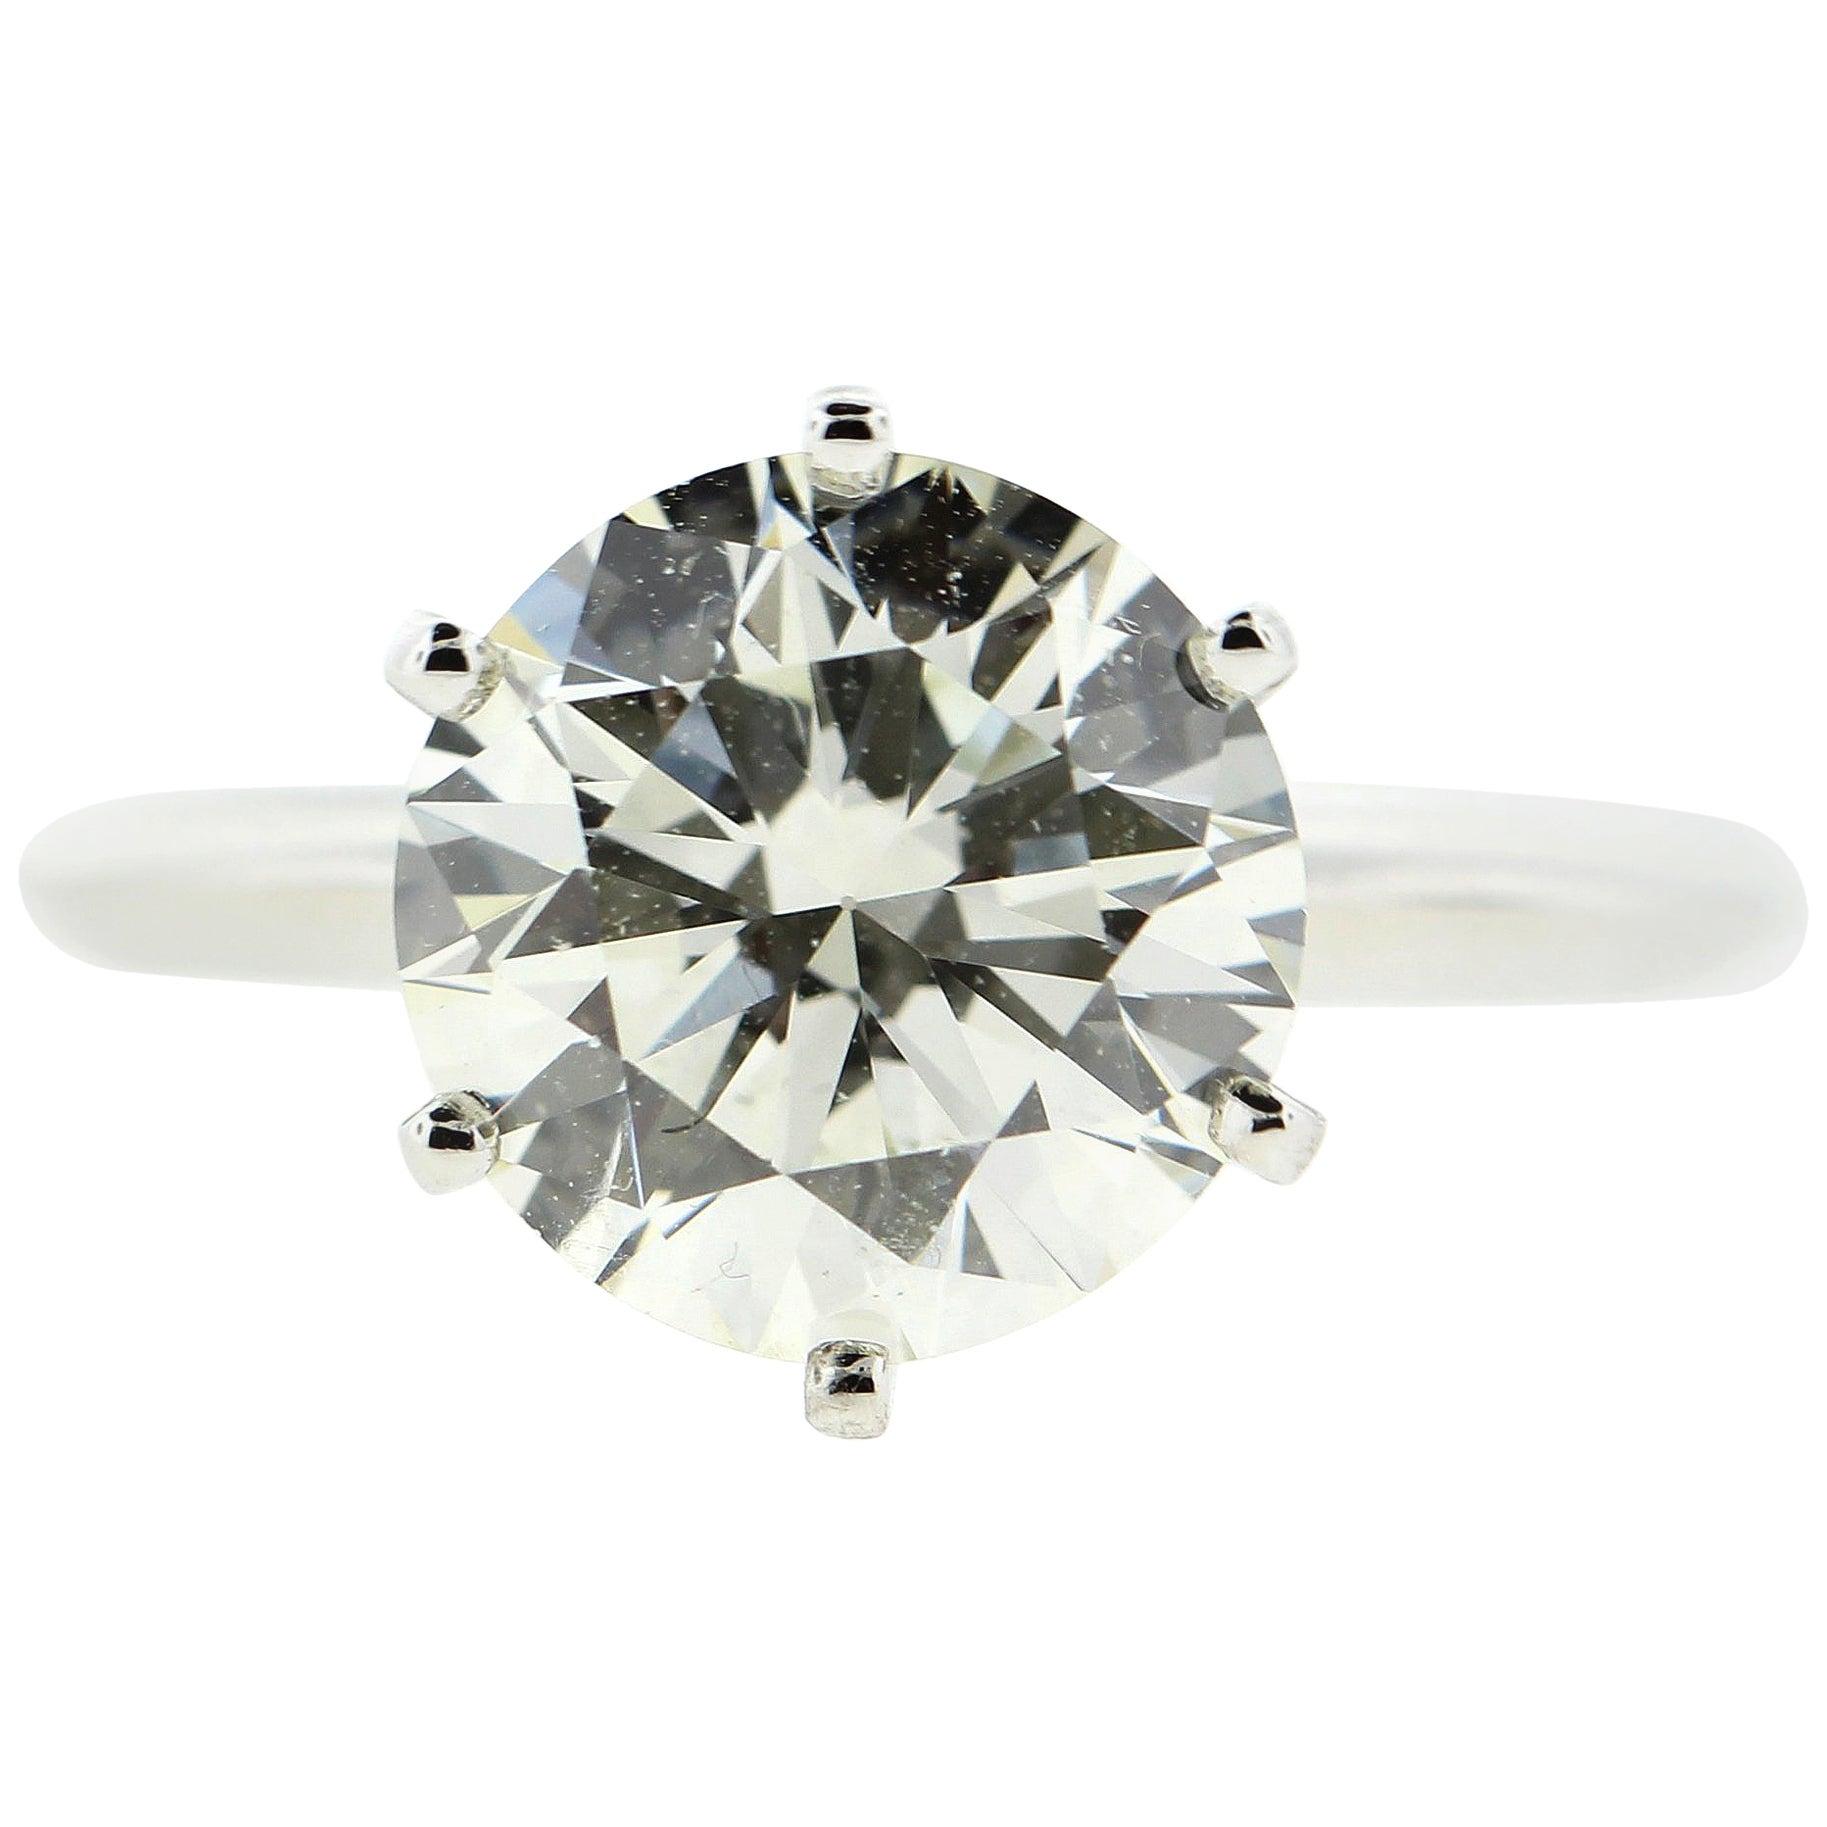 2.50 Carat Diamond Solitaire Engagement Ring 'GIA'